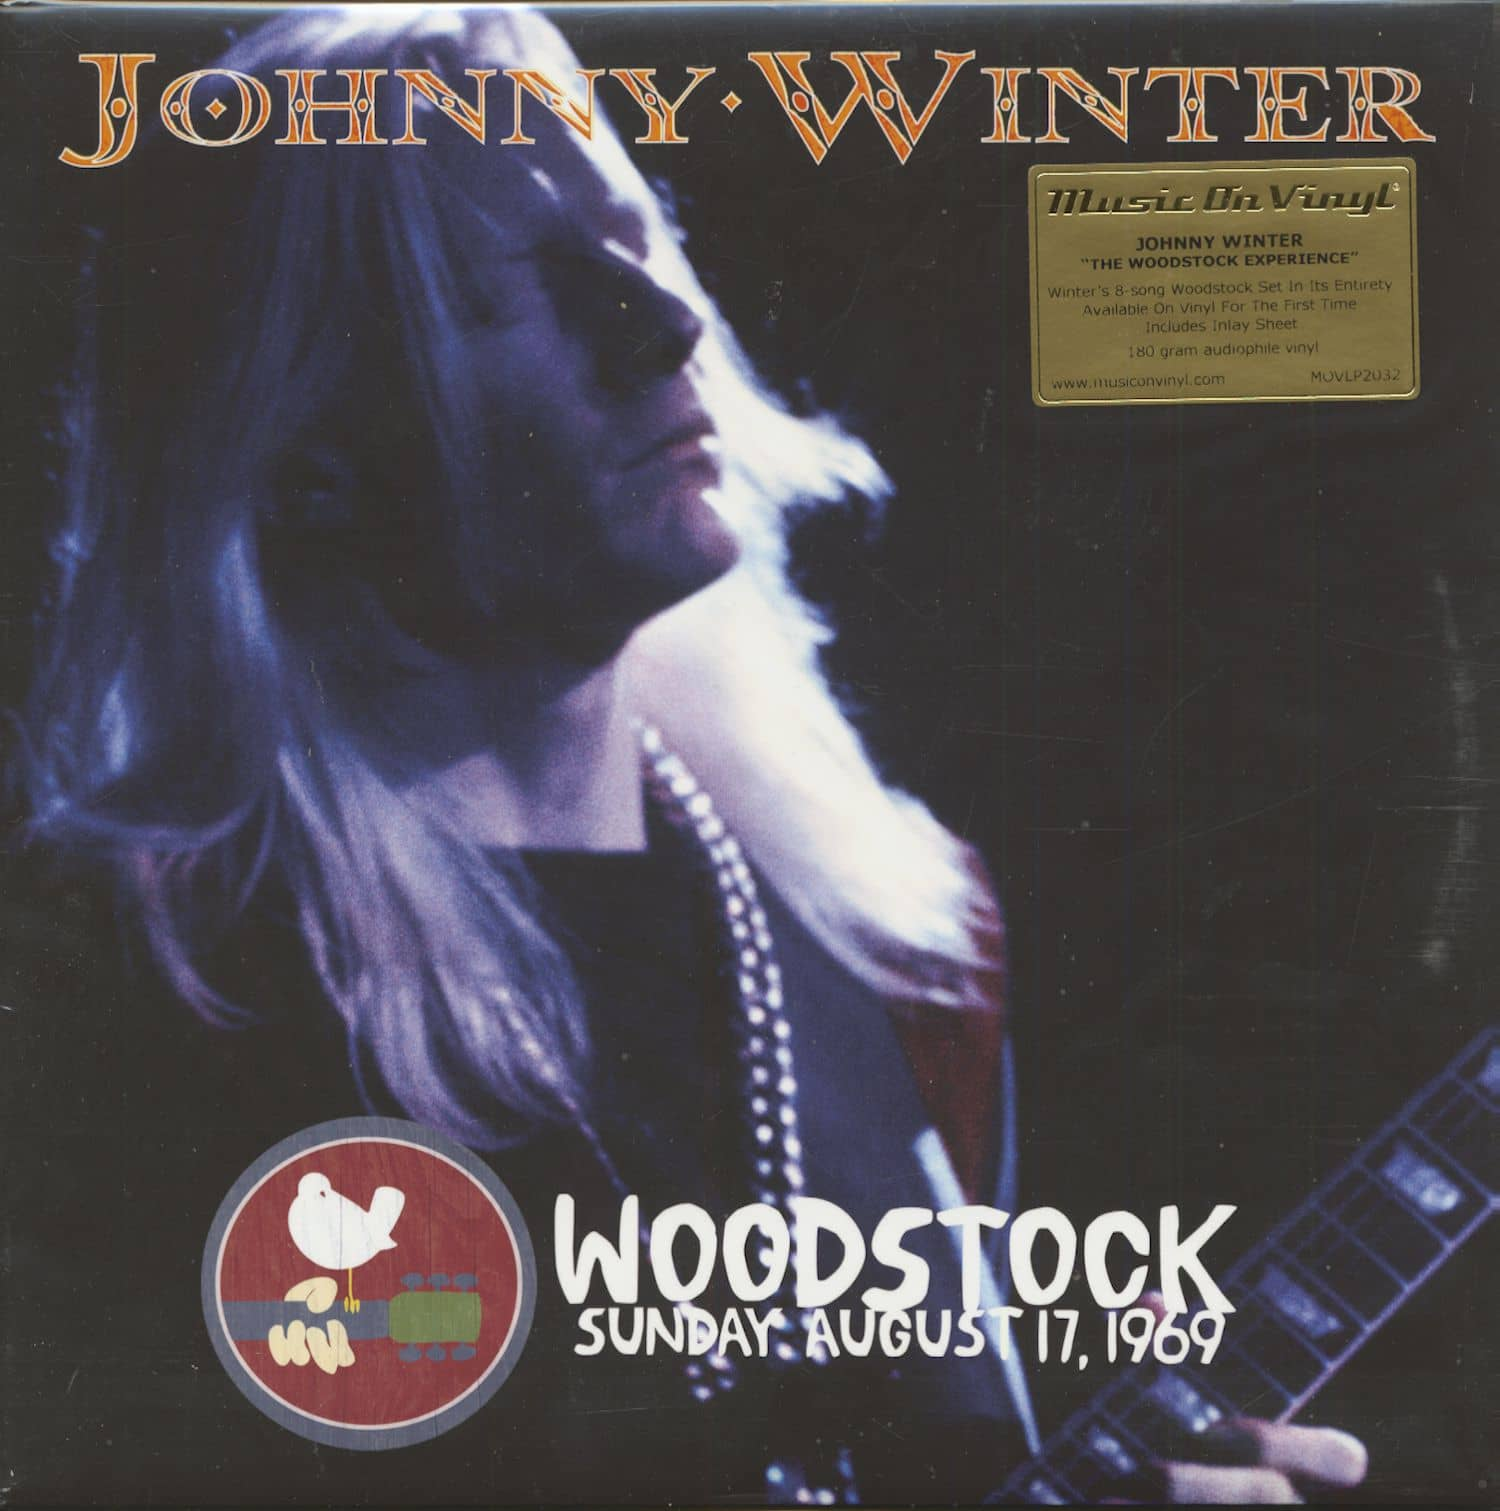 Johnny Winter Lp Woodstock Sunday August 17 1969 2 Lp